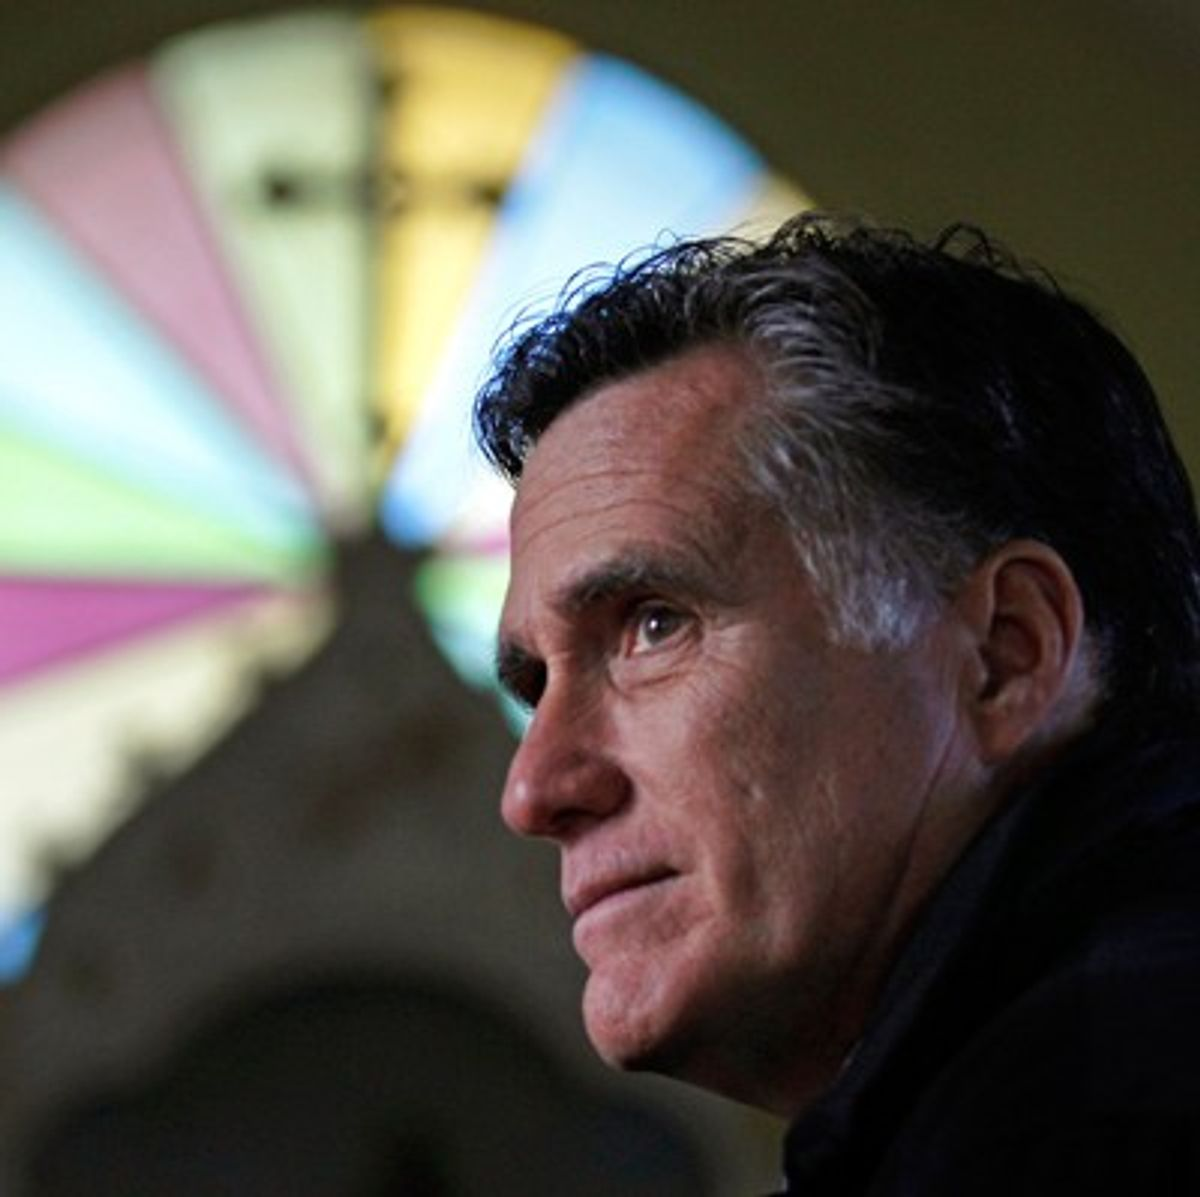 In church       (AP/Charles Krupa)